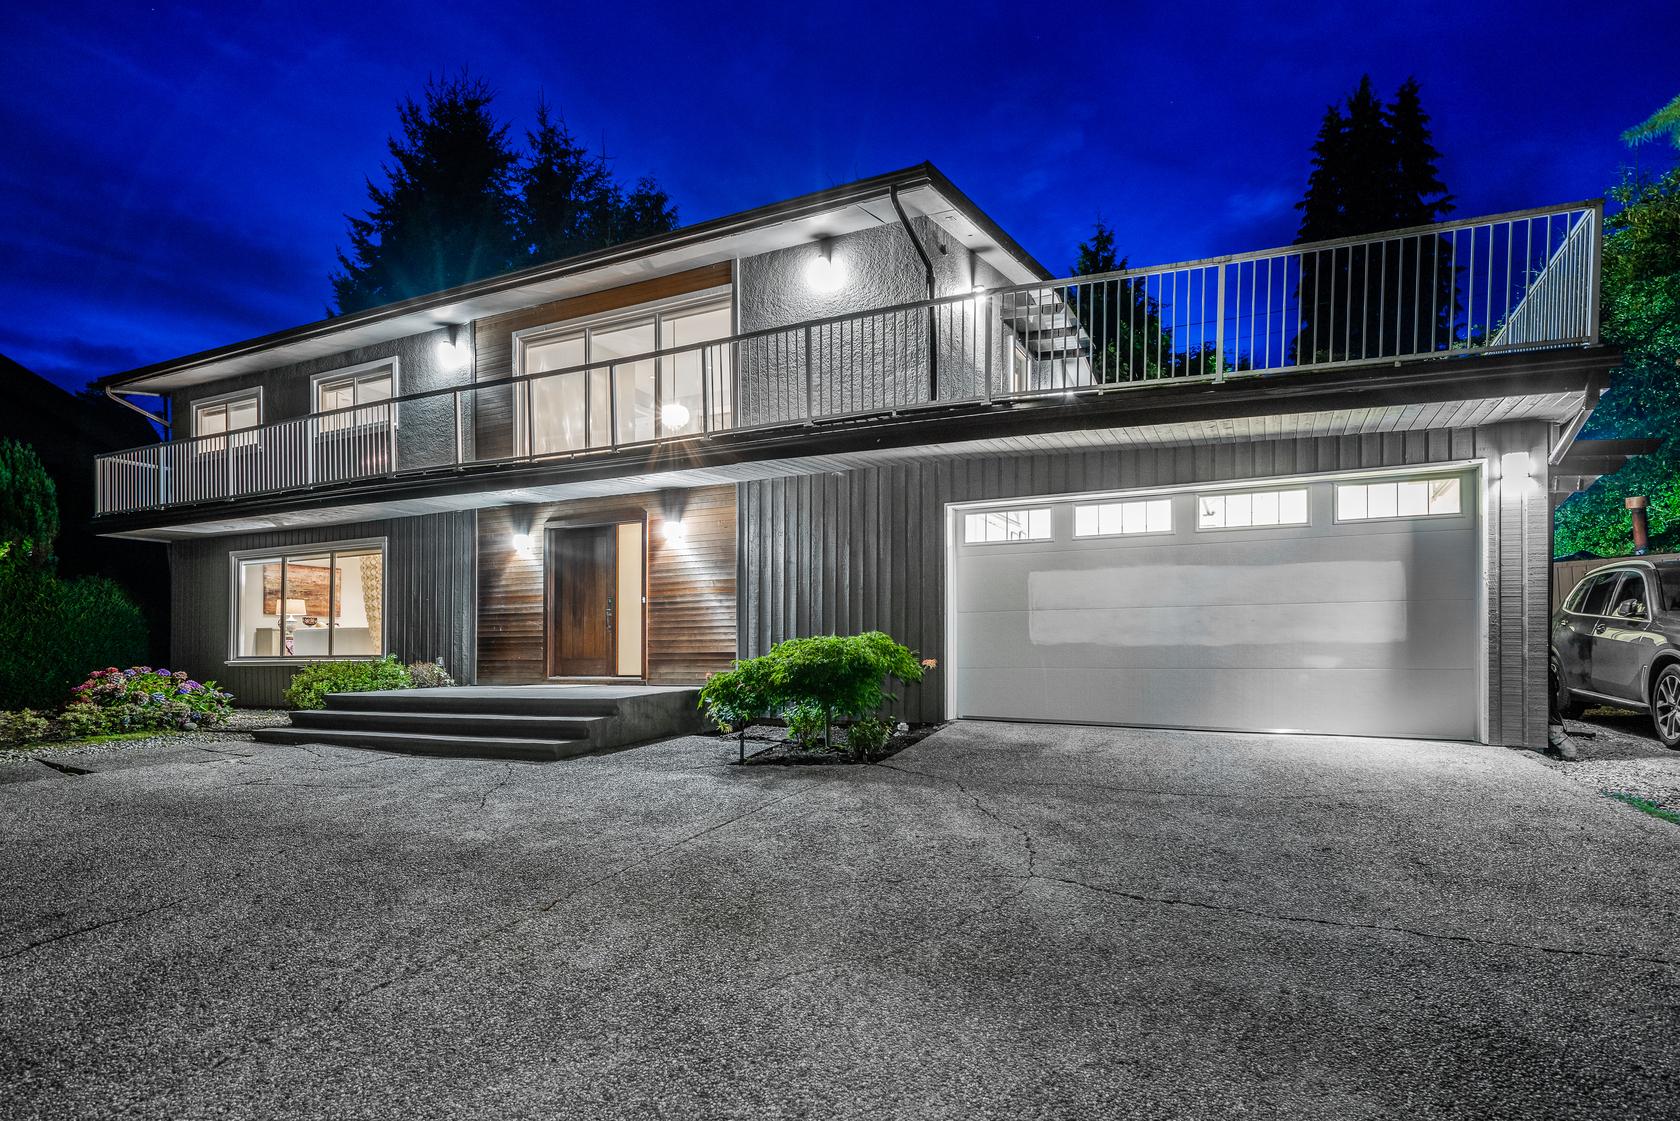 701-kenwood-road-west-vancouver-2 at 701 Kenwood Road, British Properties, West Vancouver